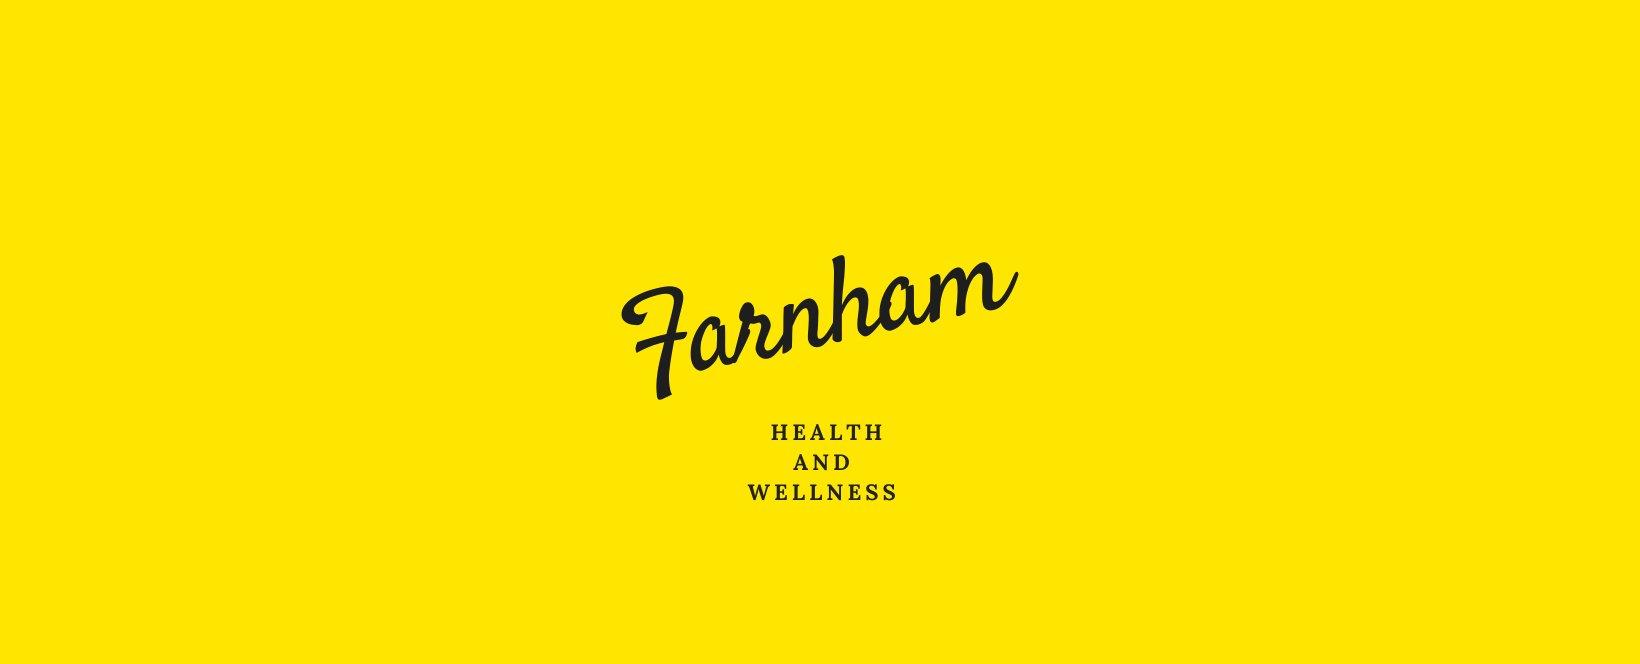 Farnham Health and Wellness